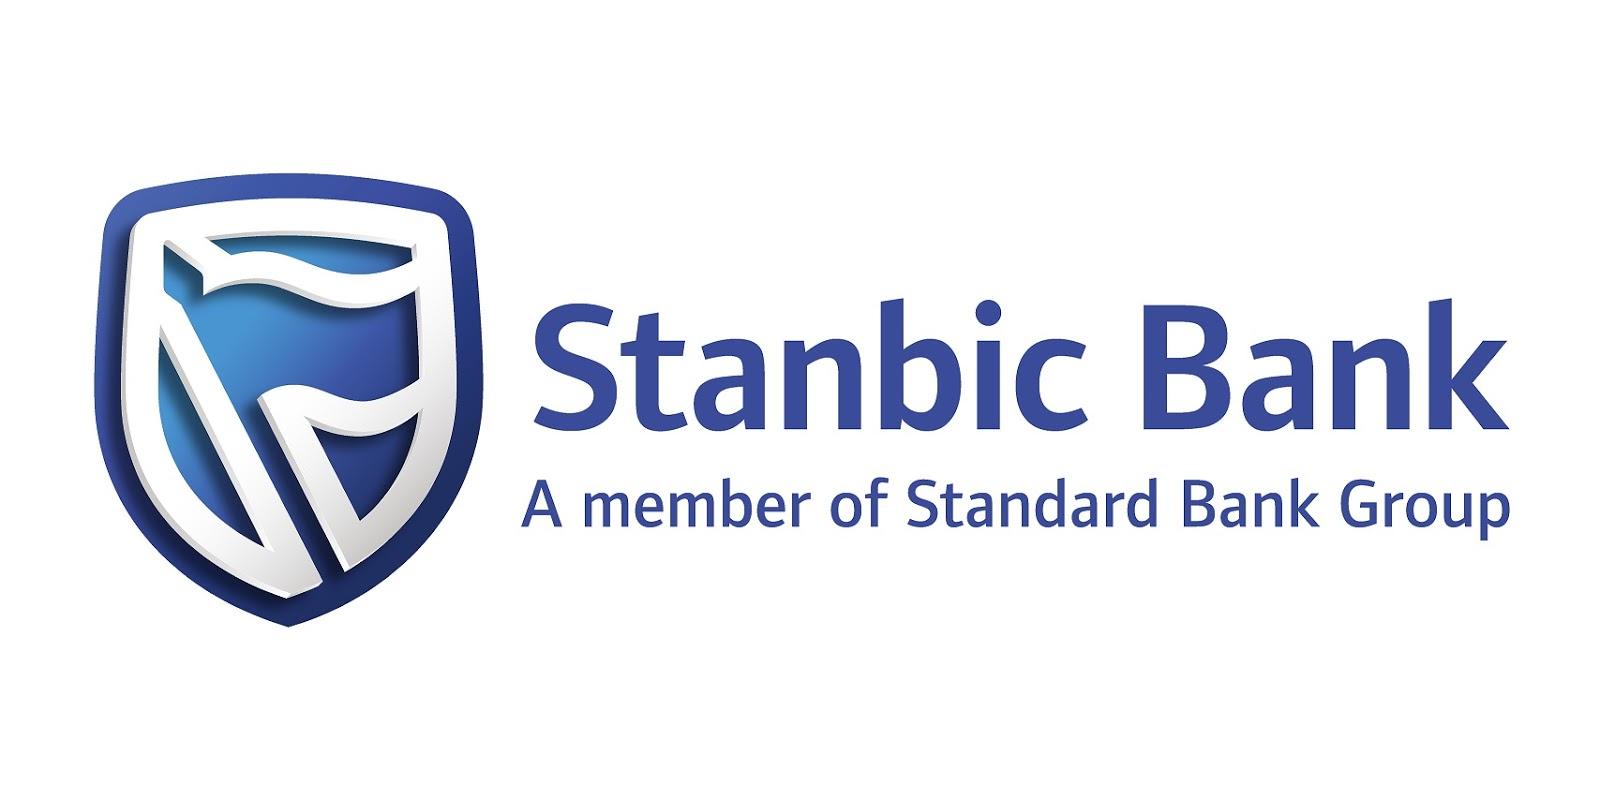 Stanbic IBTC Bank Job Recruitment 2021 (17 Positions)